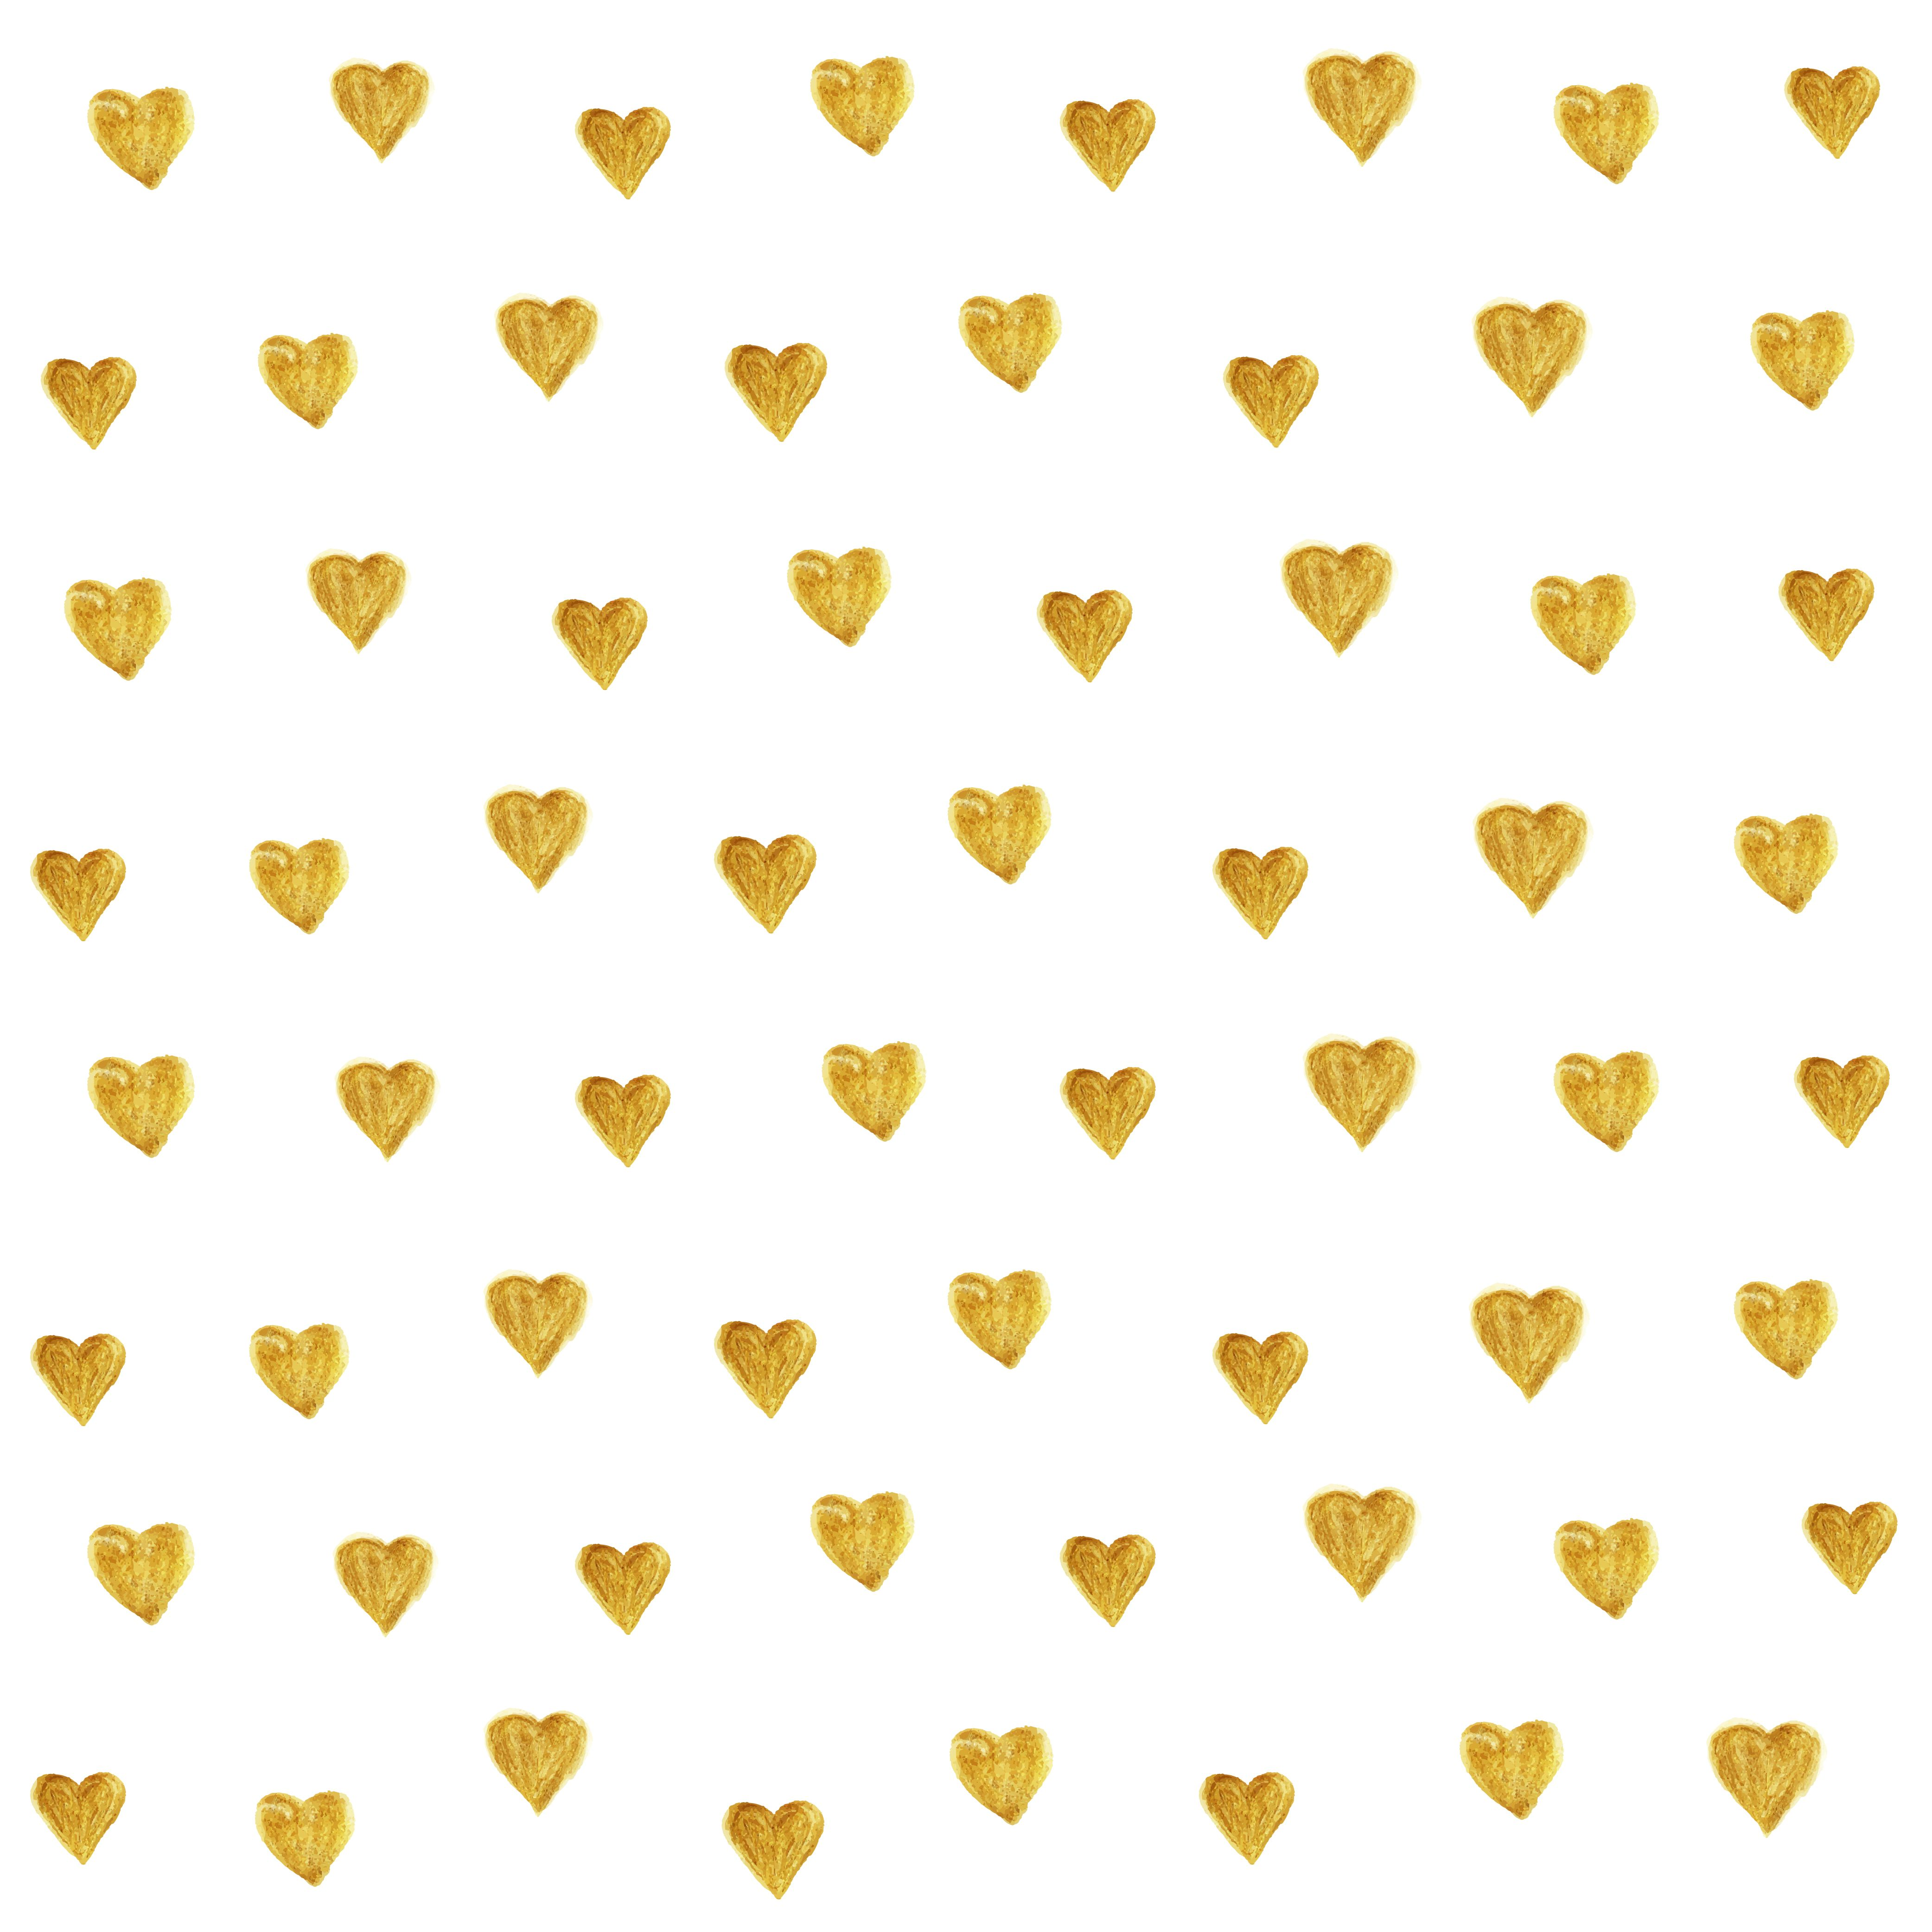 Rose Gold Wallpaper Colors Fond Ecran Rose Fond D Ecran Fond Ecran Paillettes Wallpaper Rose Fond Ecran Fond Blanc Fond D Ecran Rose Gold